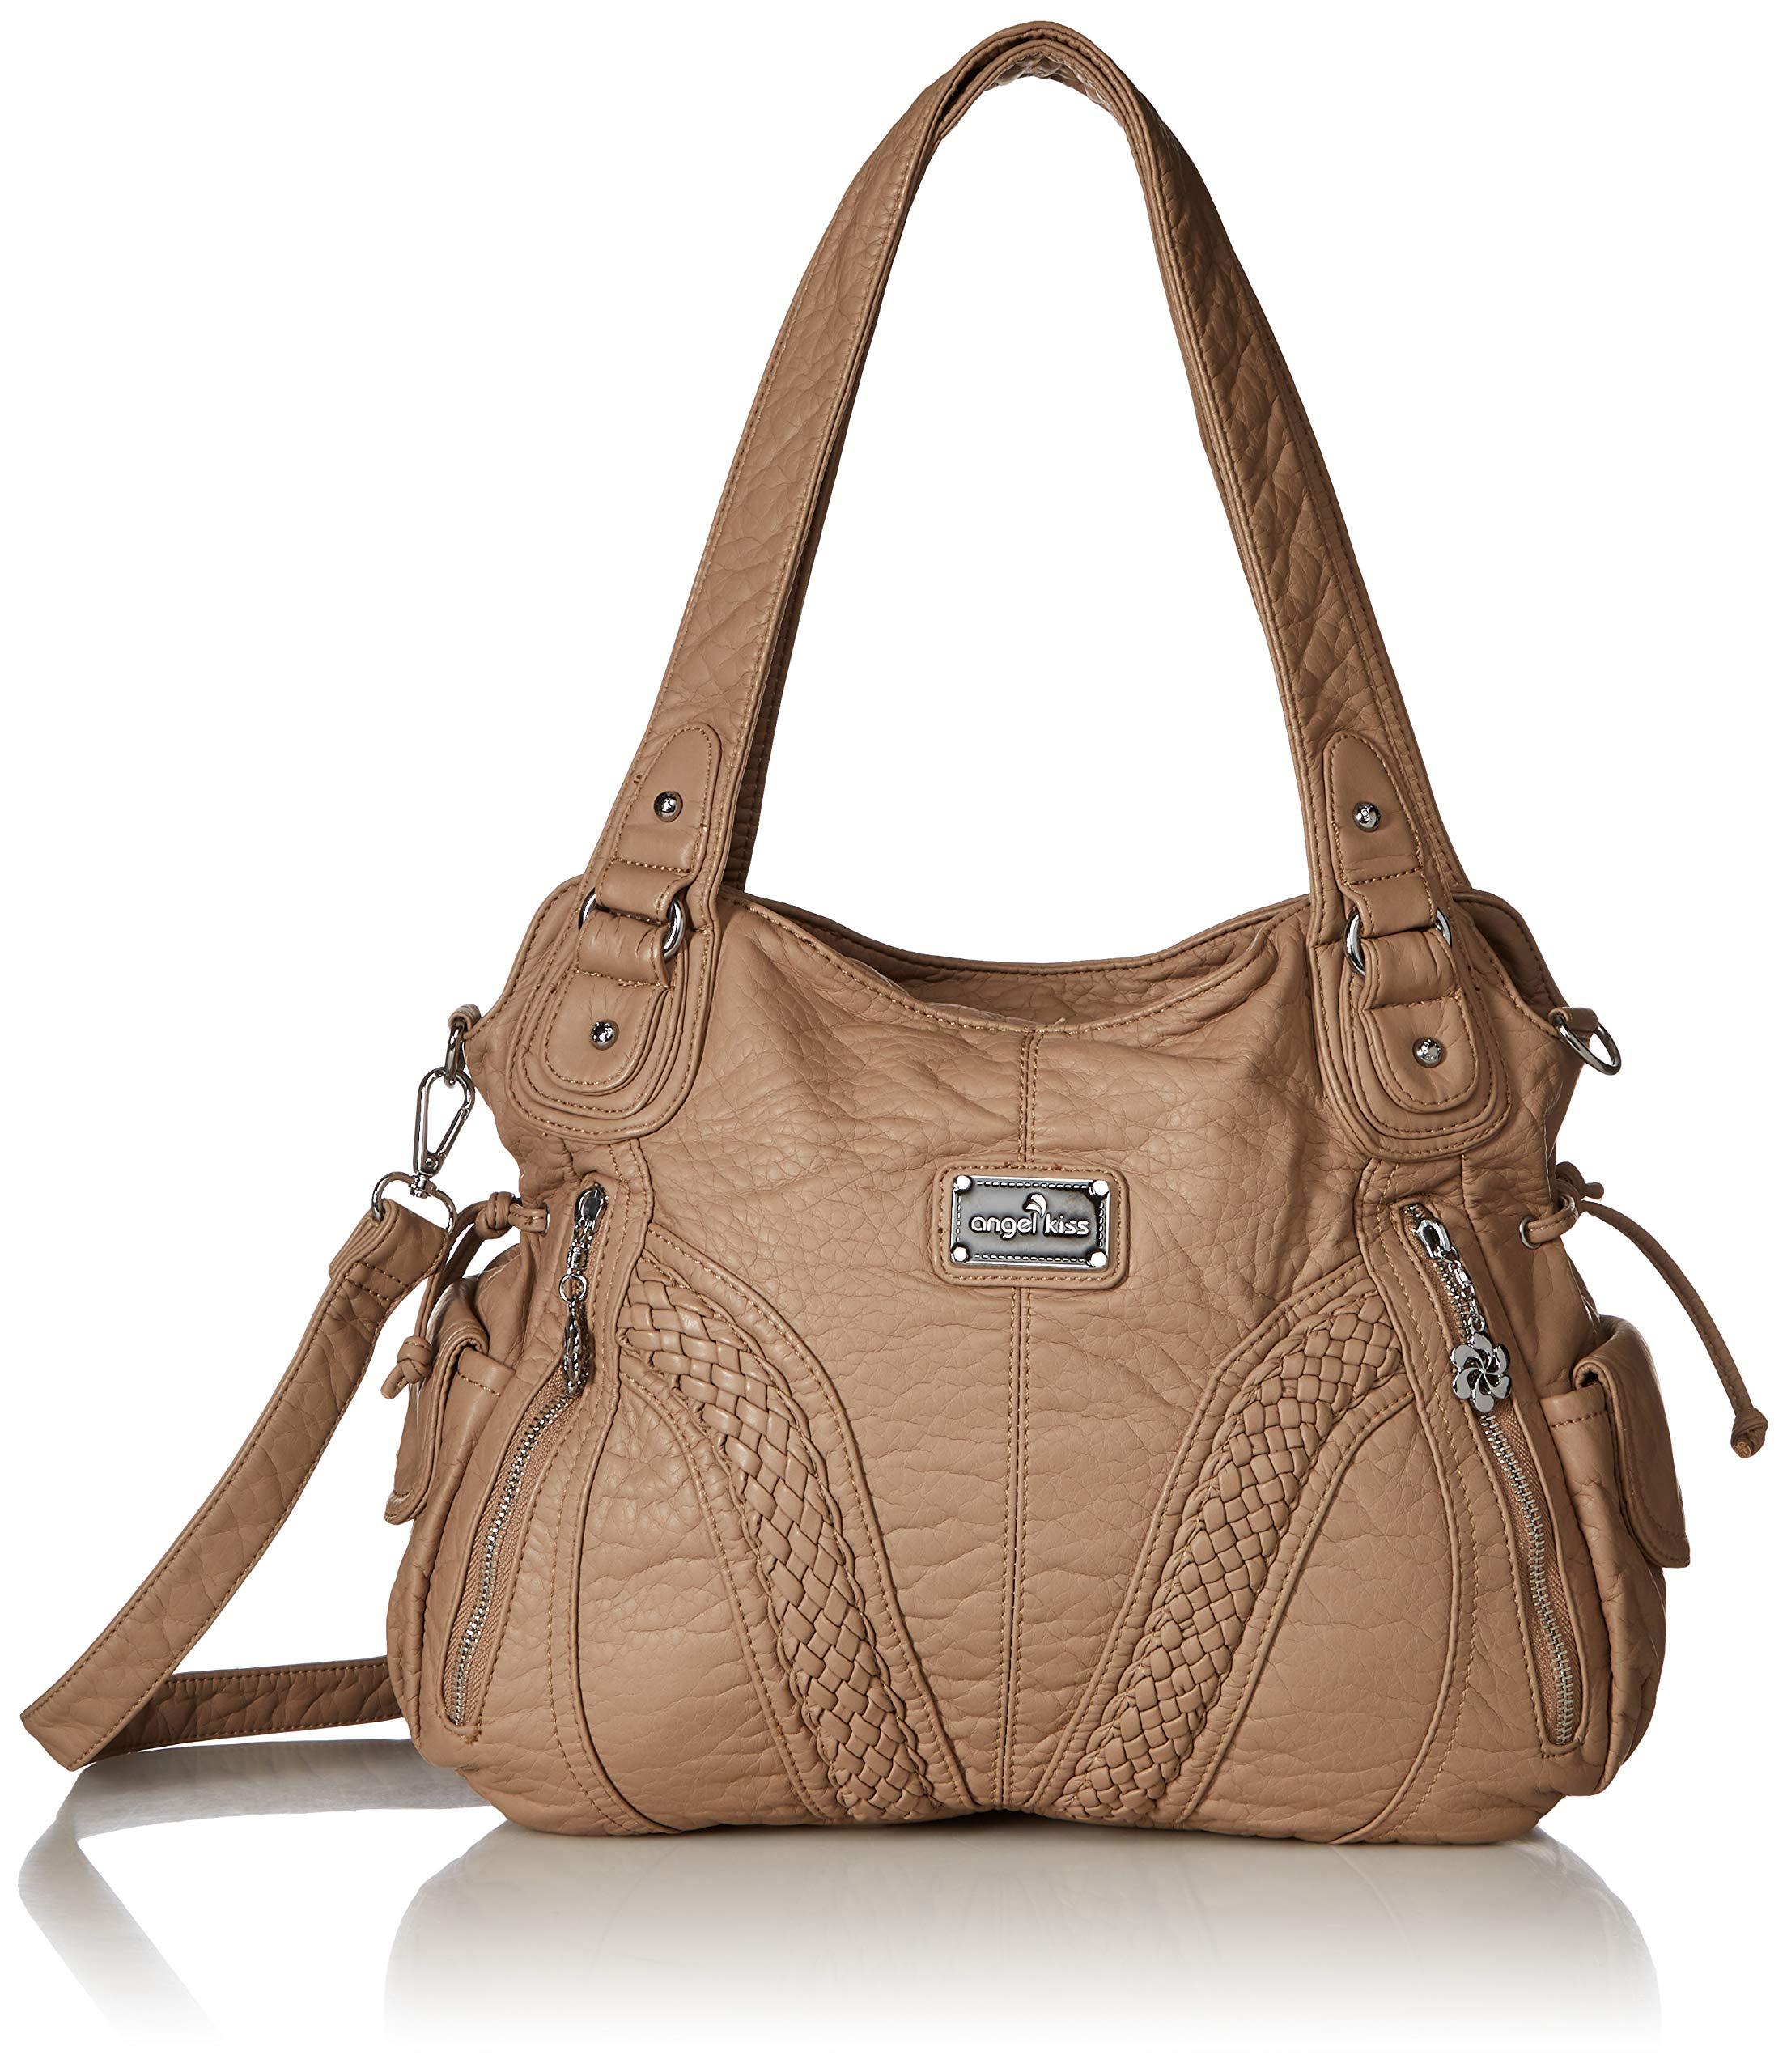 Angelkiss Women Top Handle Satchel Handbags Shoulder Bag Messenger Tote Washed Leather Purses Bag (Soil Grey) …